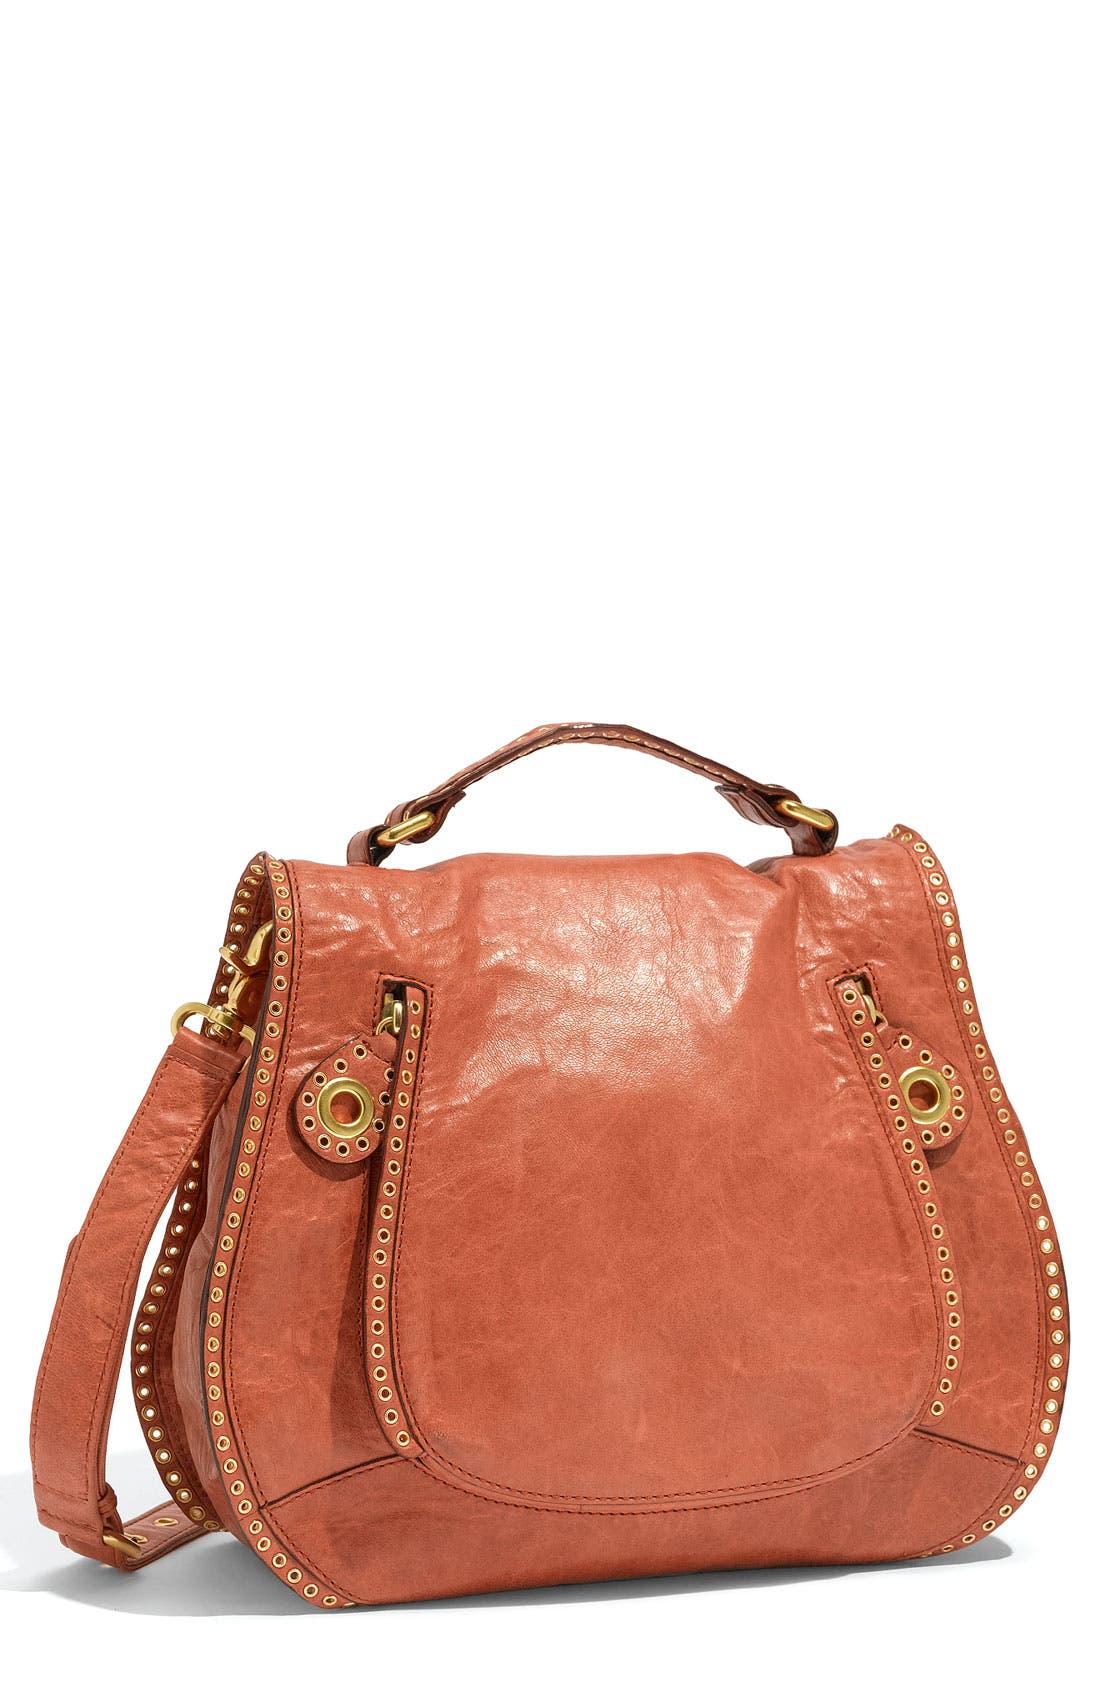 Alternate Image 1 Selected - Rebecca Minkoff 'Vanity' Glazed Leather Crossbody Bag